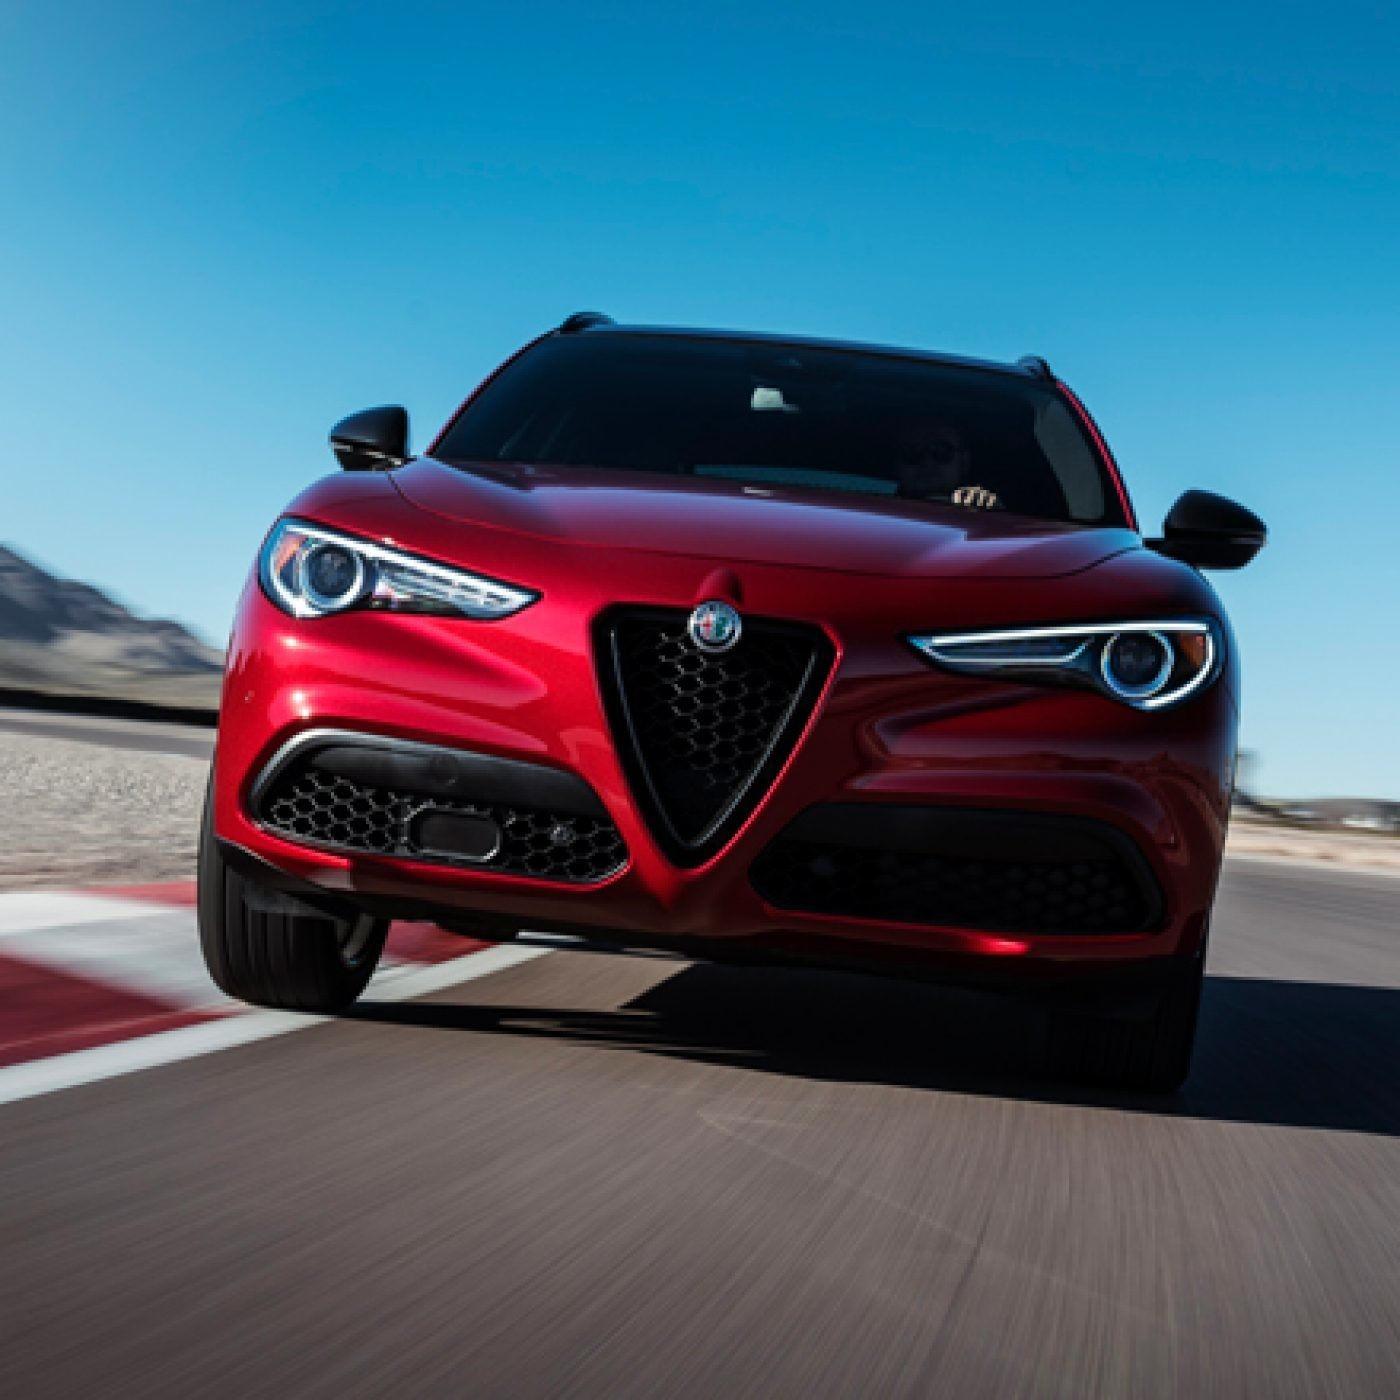 2018 Alfa Romeo Stelvio High Performance SUV